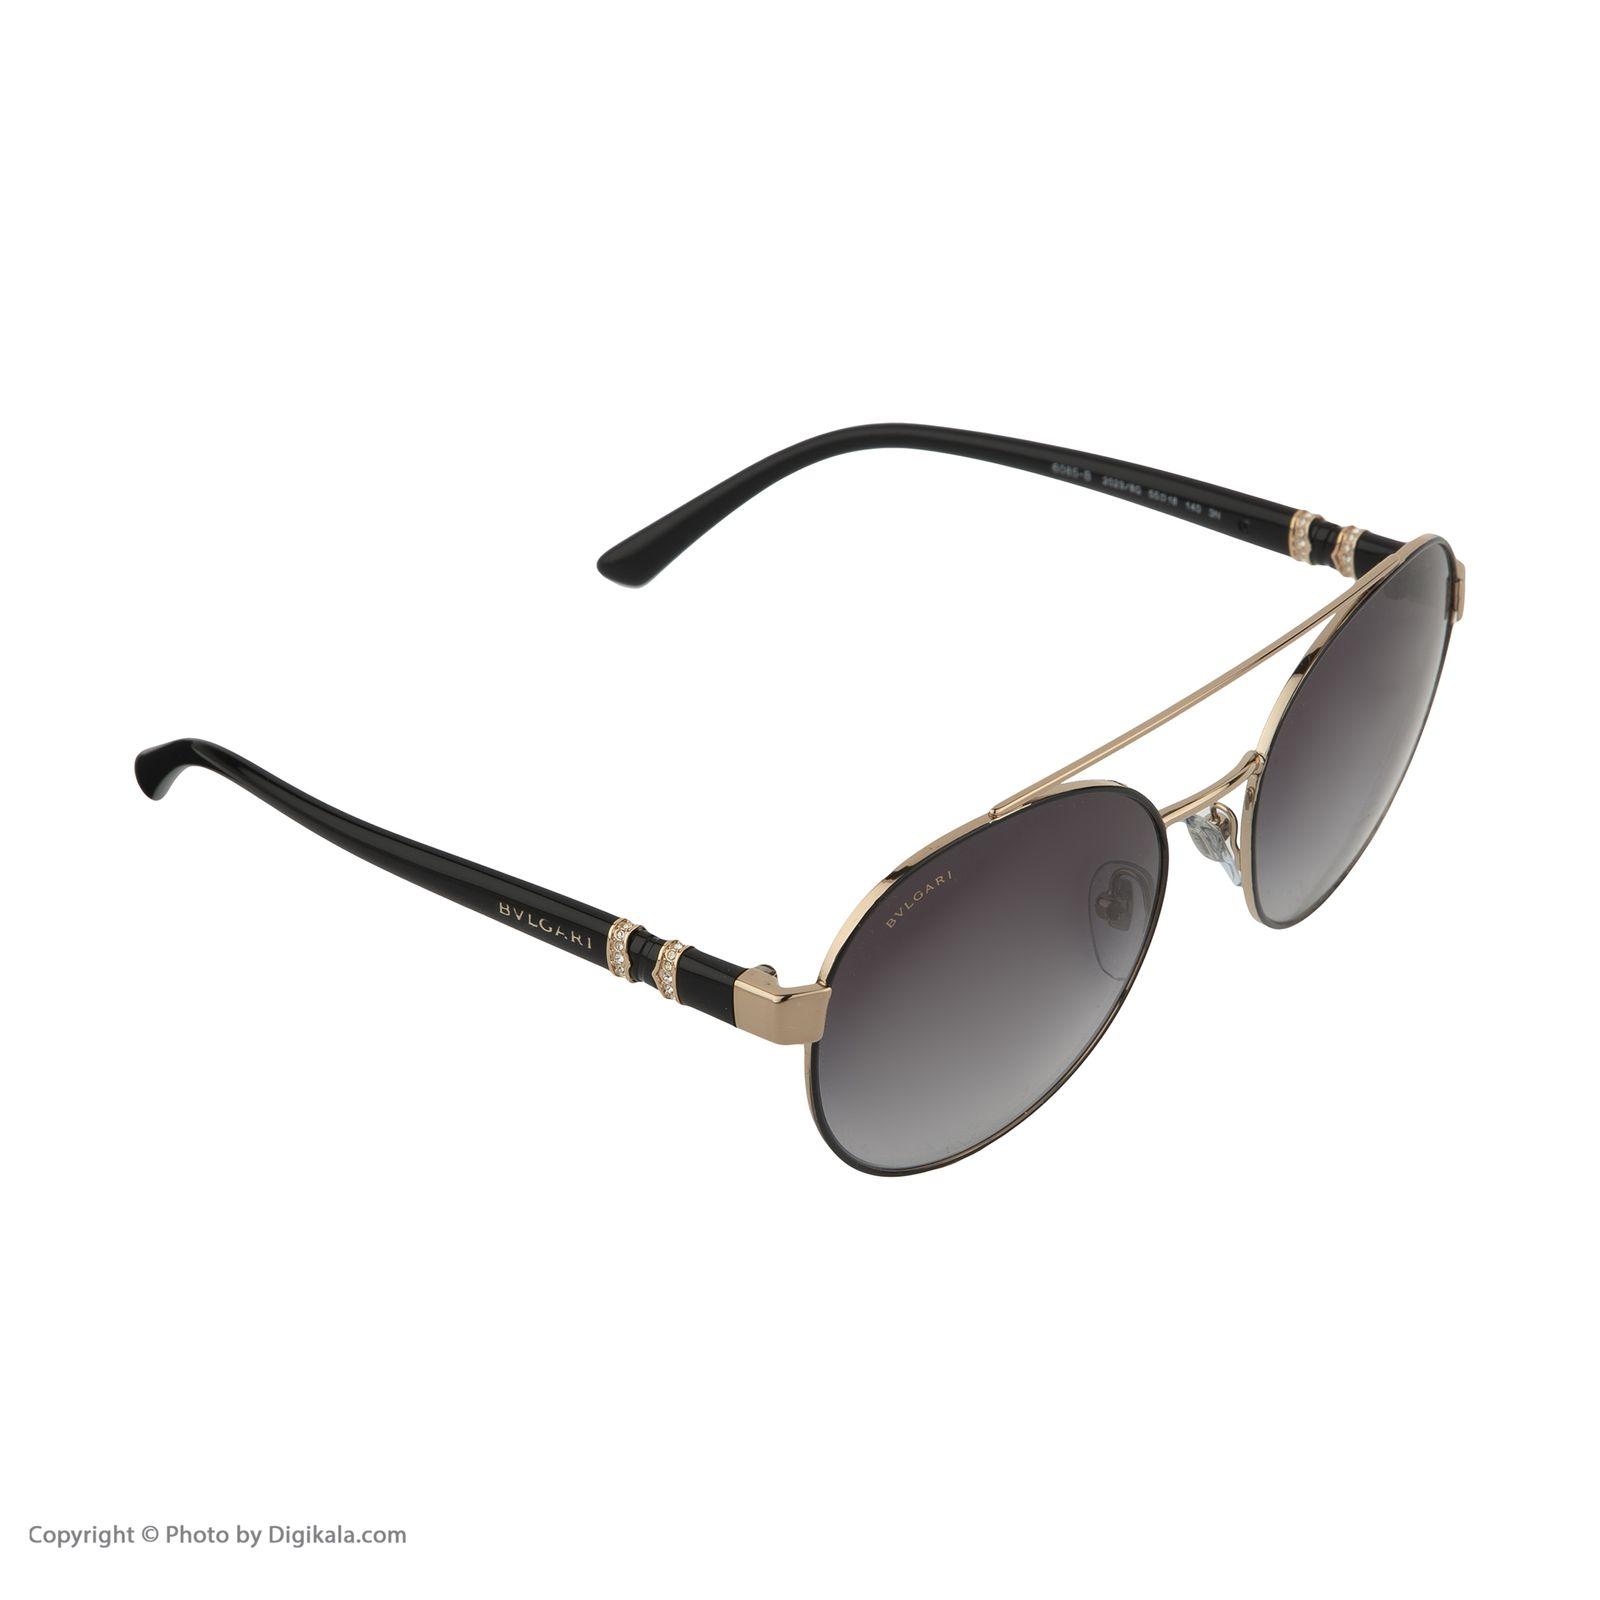 عینک آفتابی زنانه بولگاری مدل BV6085B 20238G -  - 5